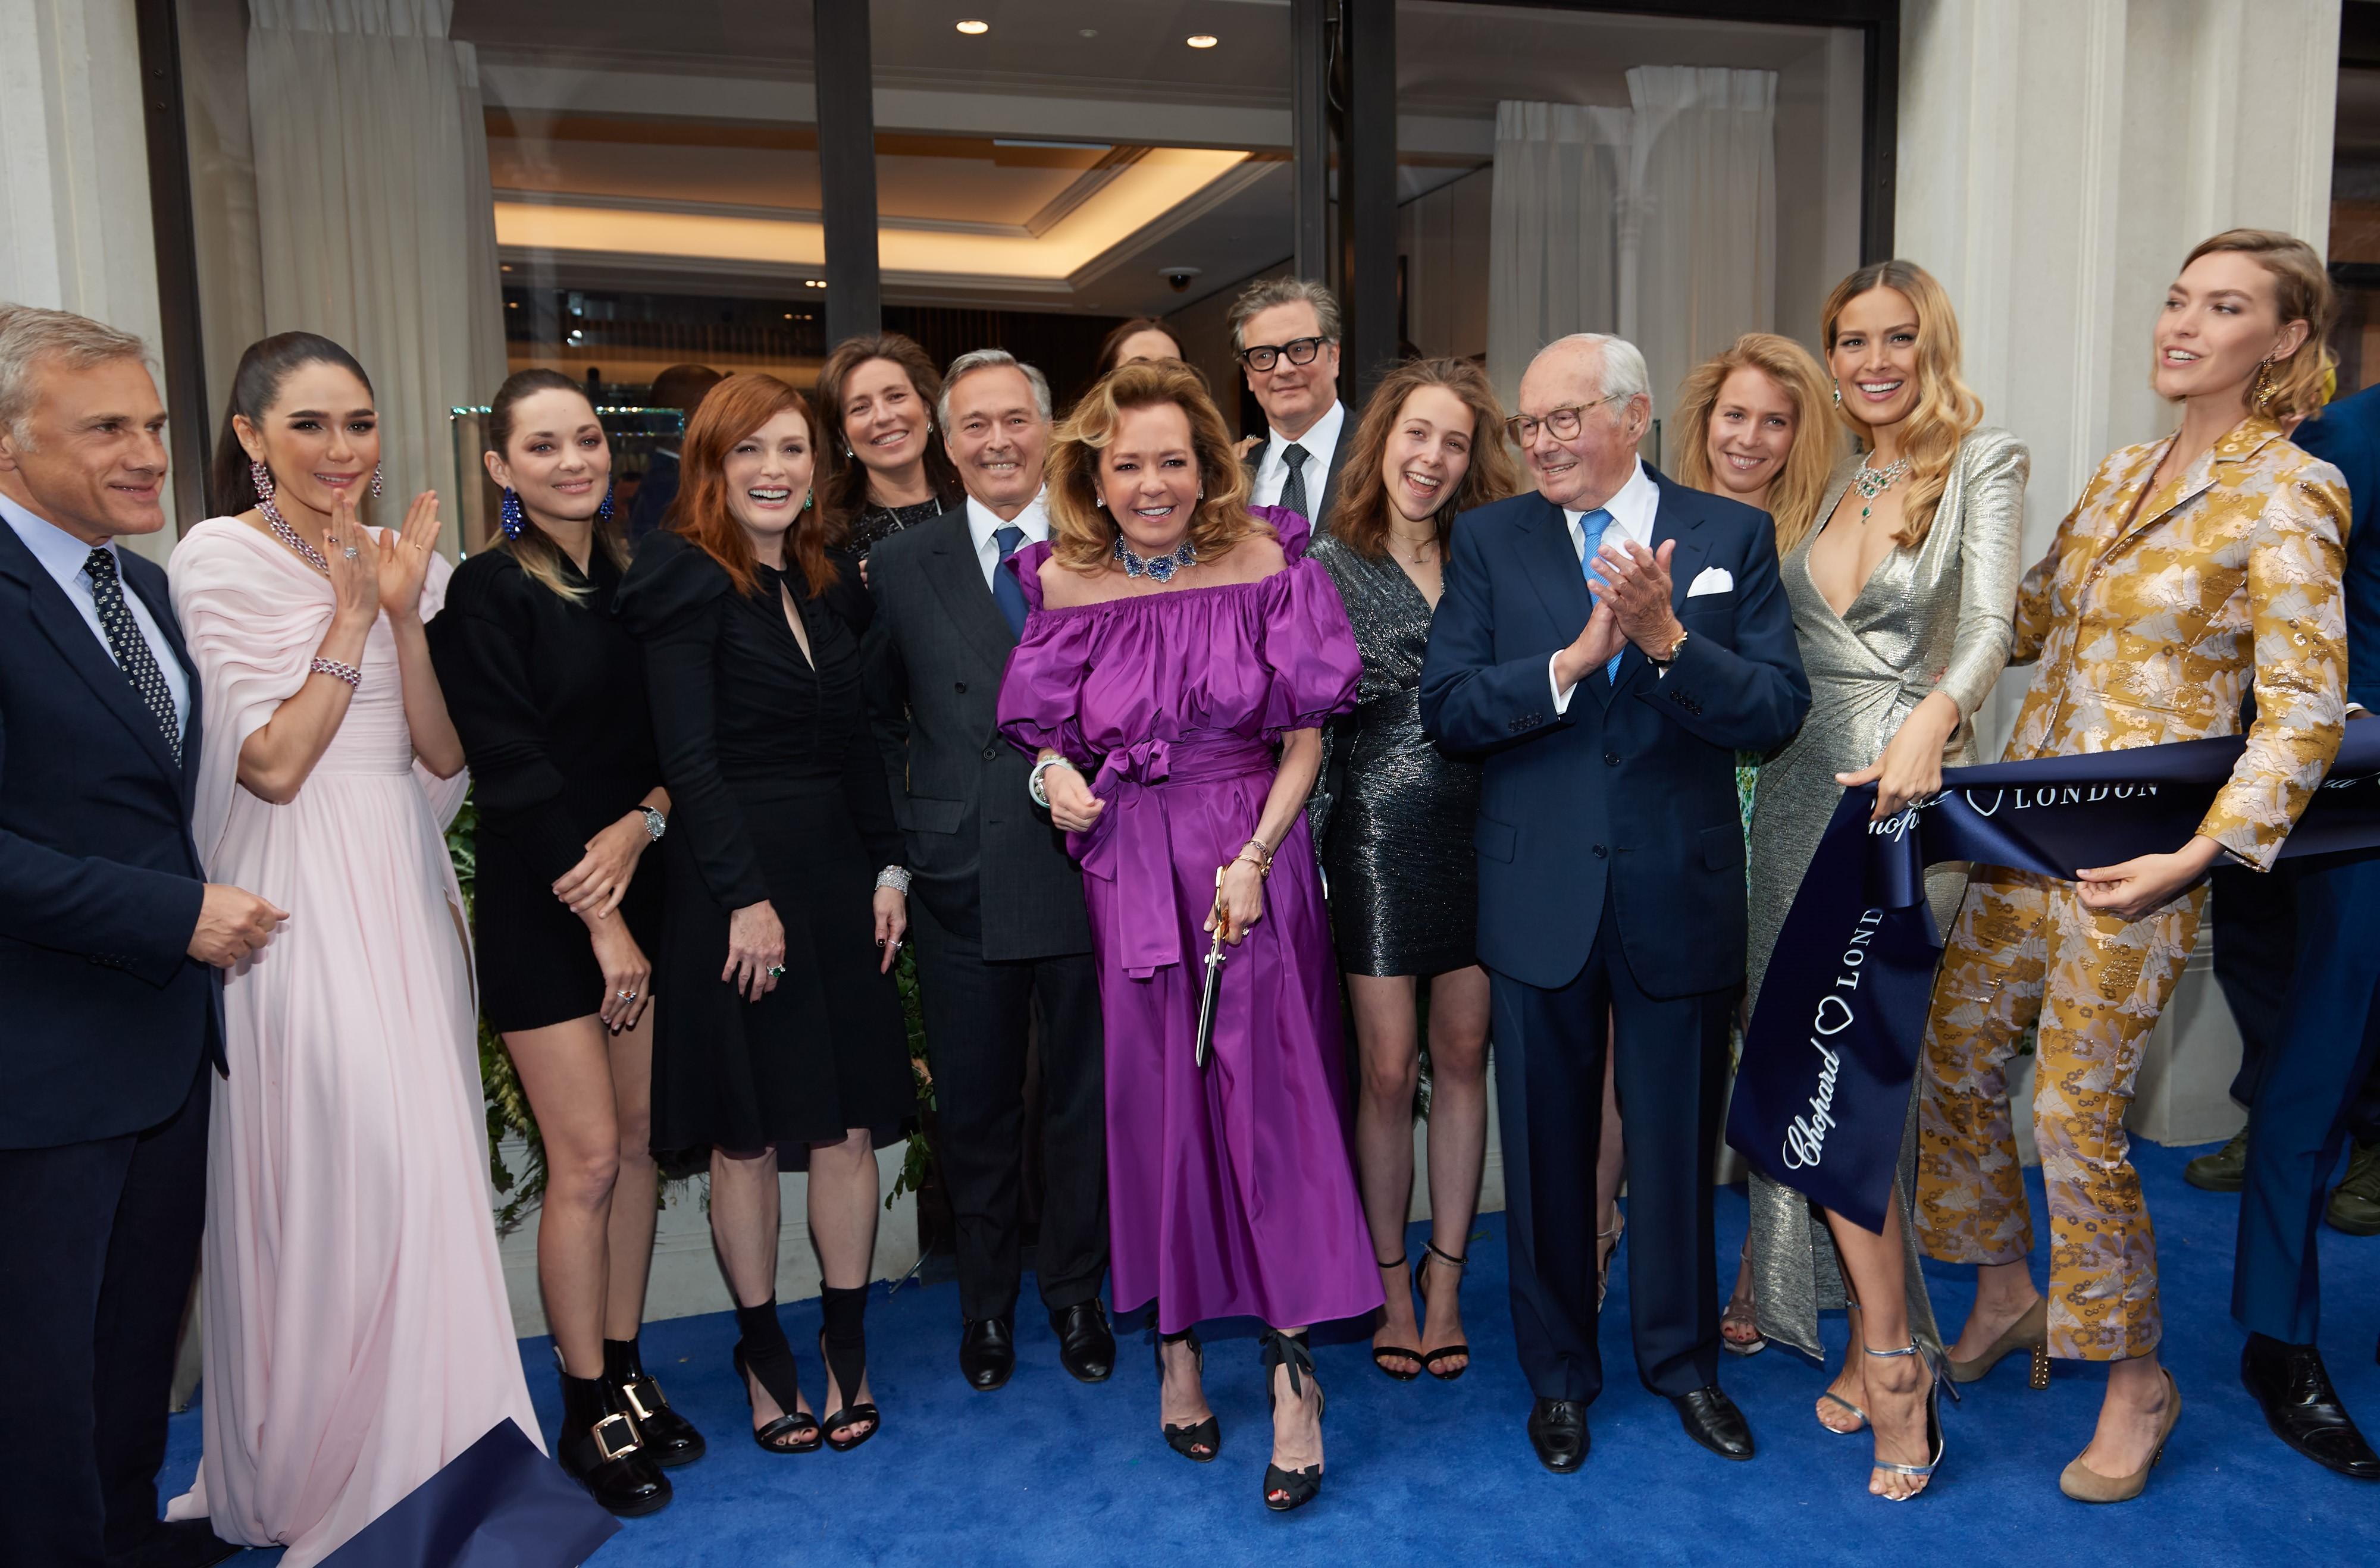 Marion Cotillard, Julianne Moore, Caroline Scheufele, Petra Nemcova